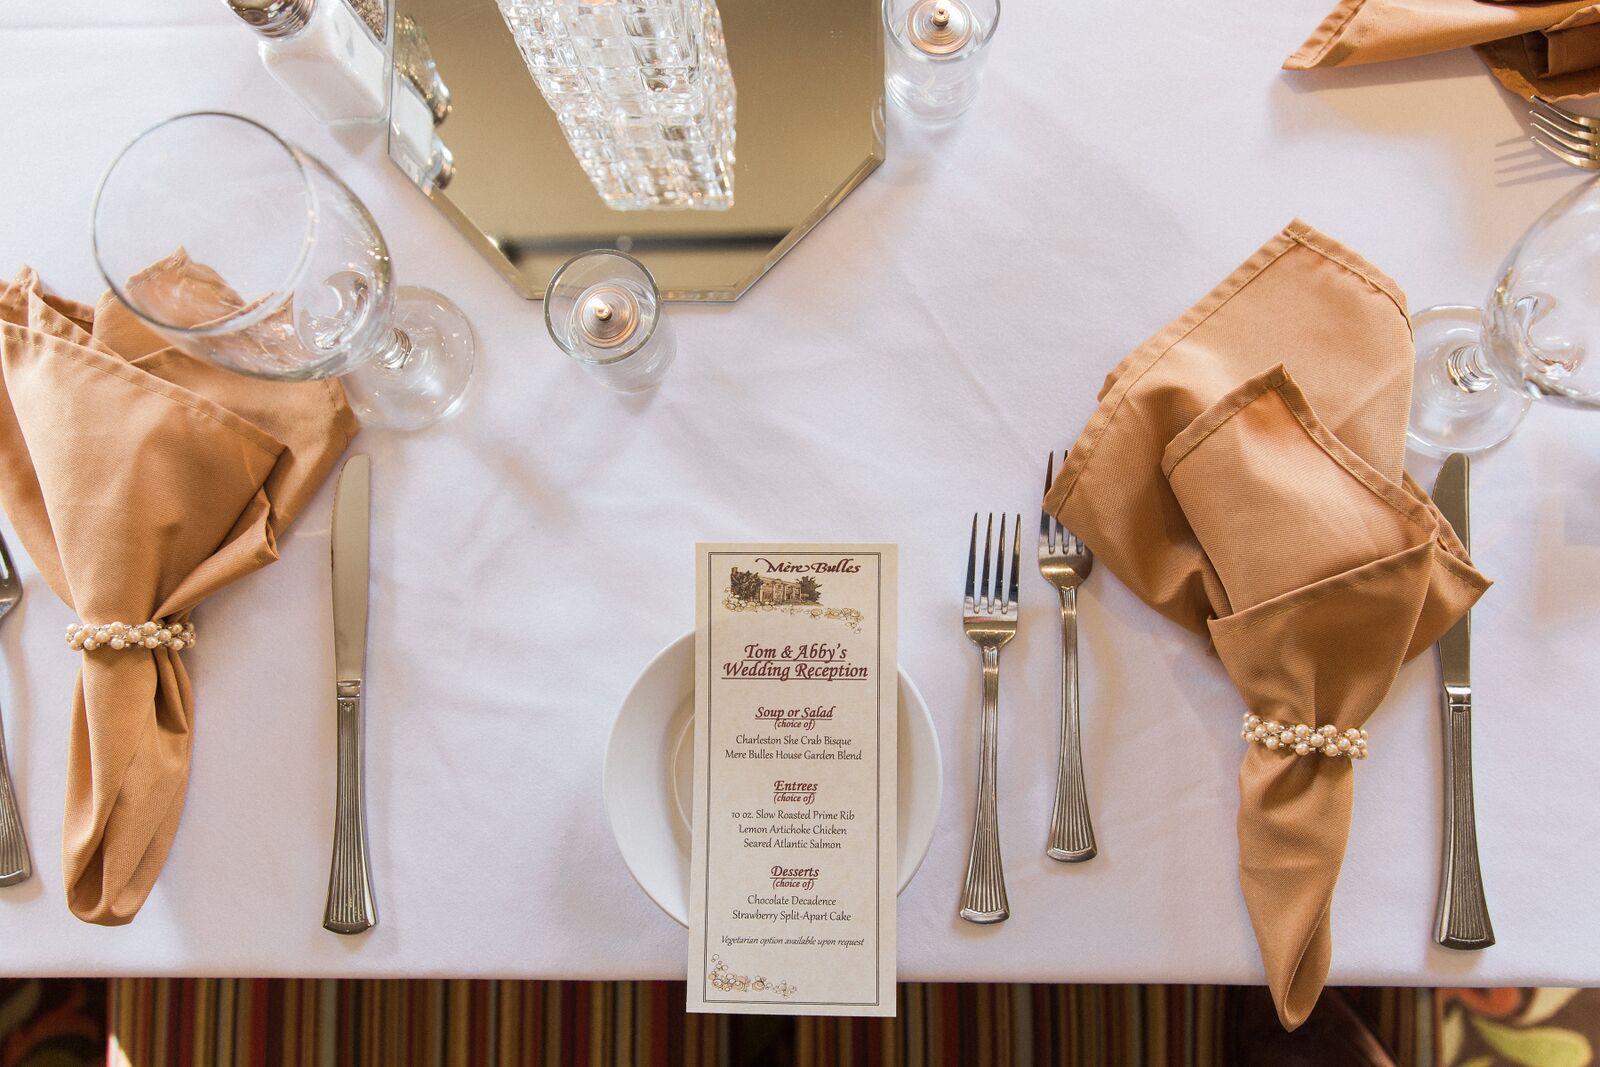 Wedding Menu Options at Mere Bulles Nashville